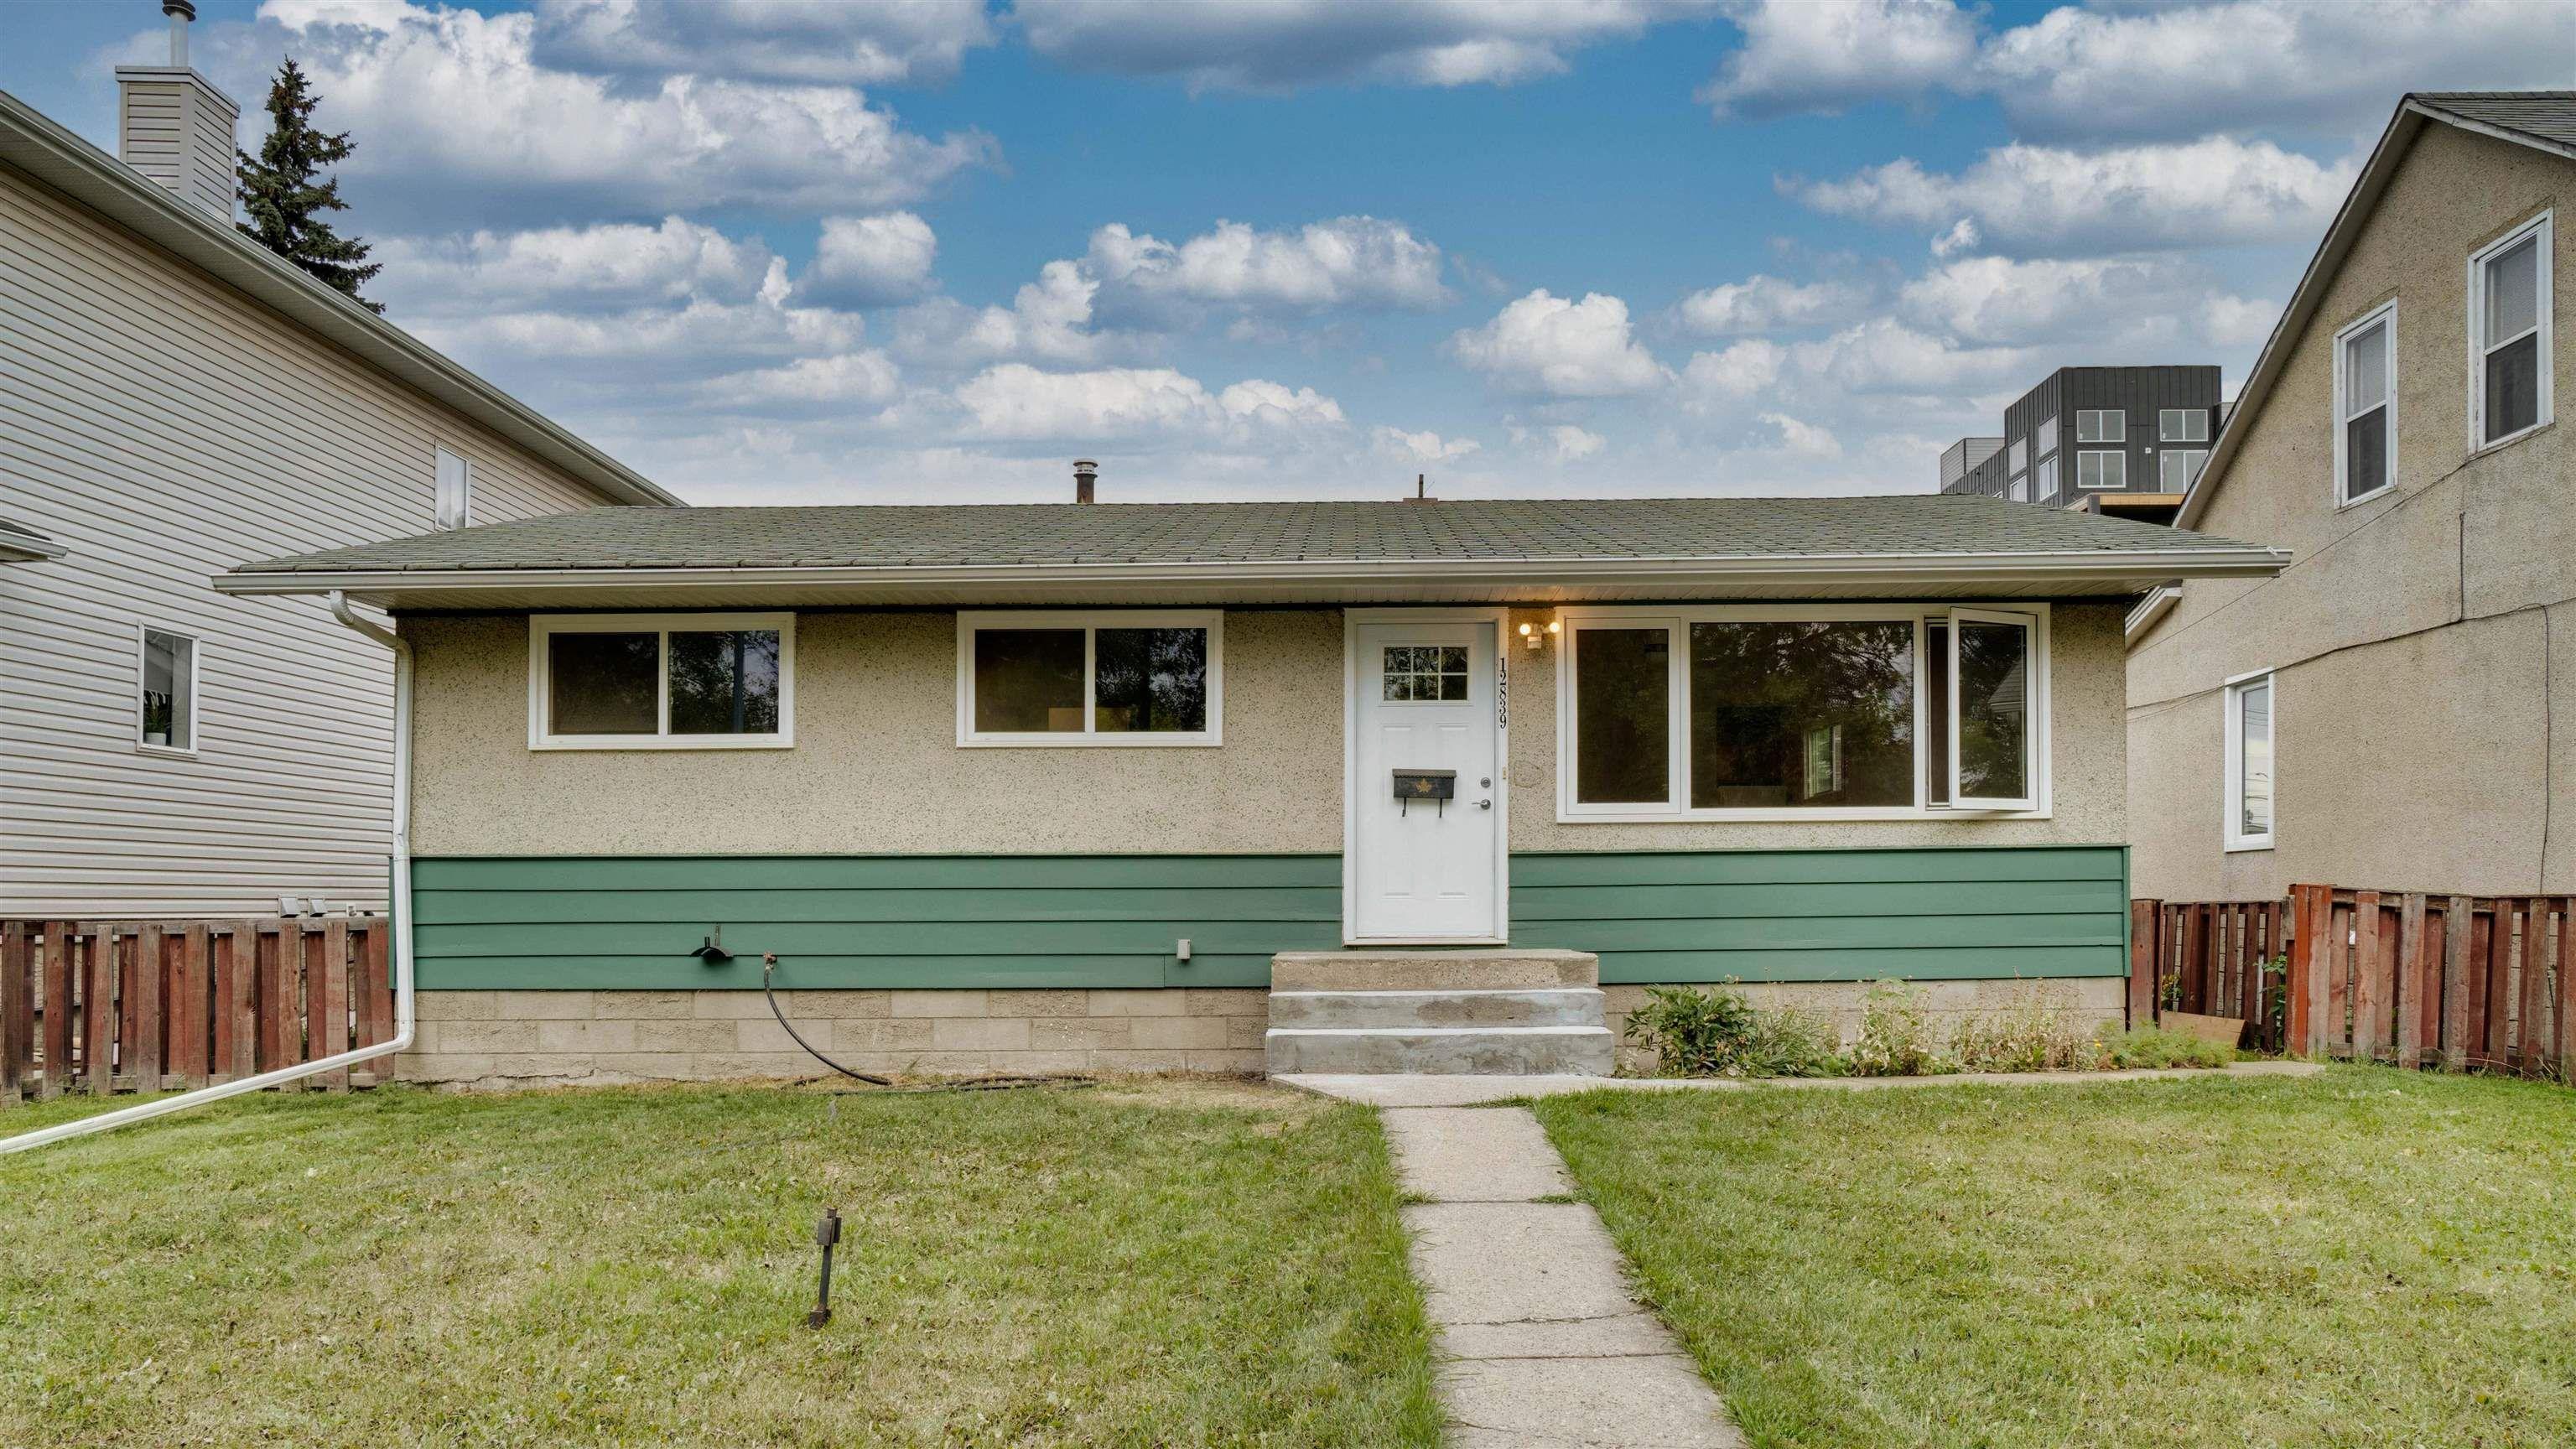 Main Photo: 12839 67 Street in Edmonton: Zone 02 House for sale : MLS®# E4260816